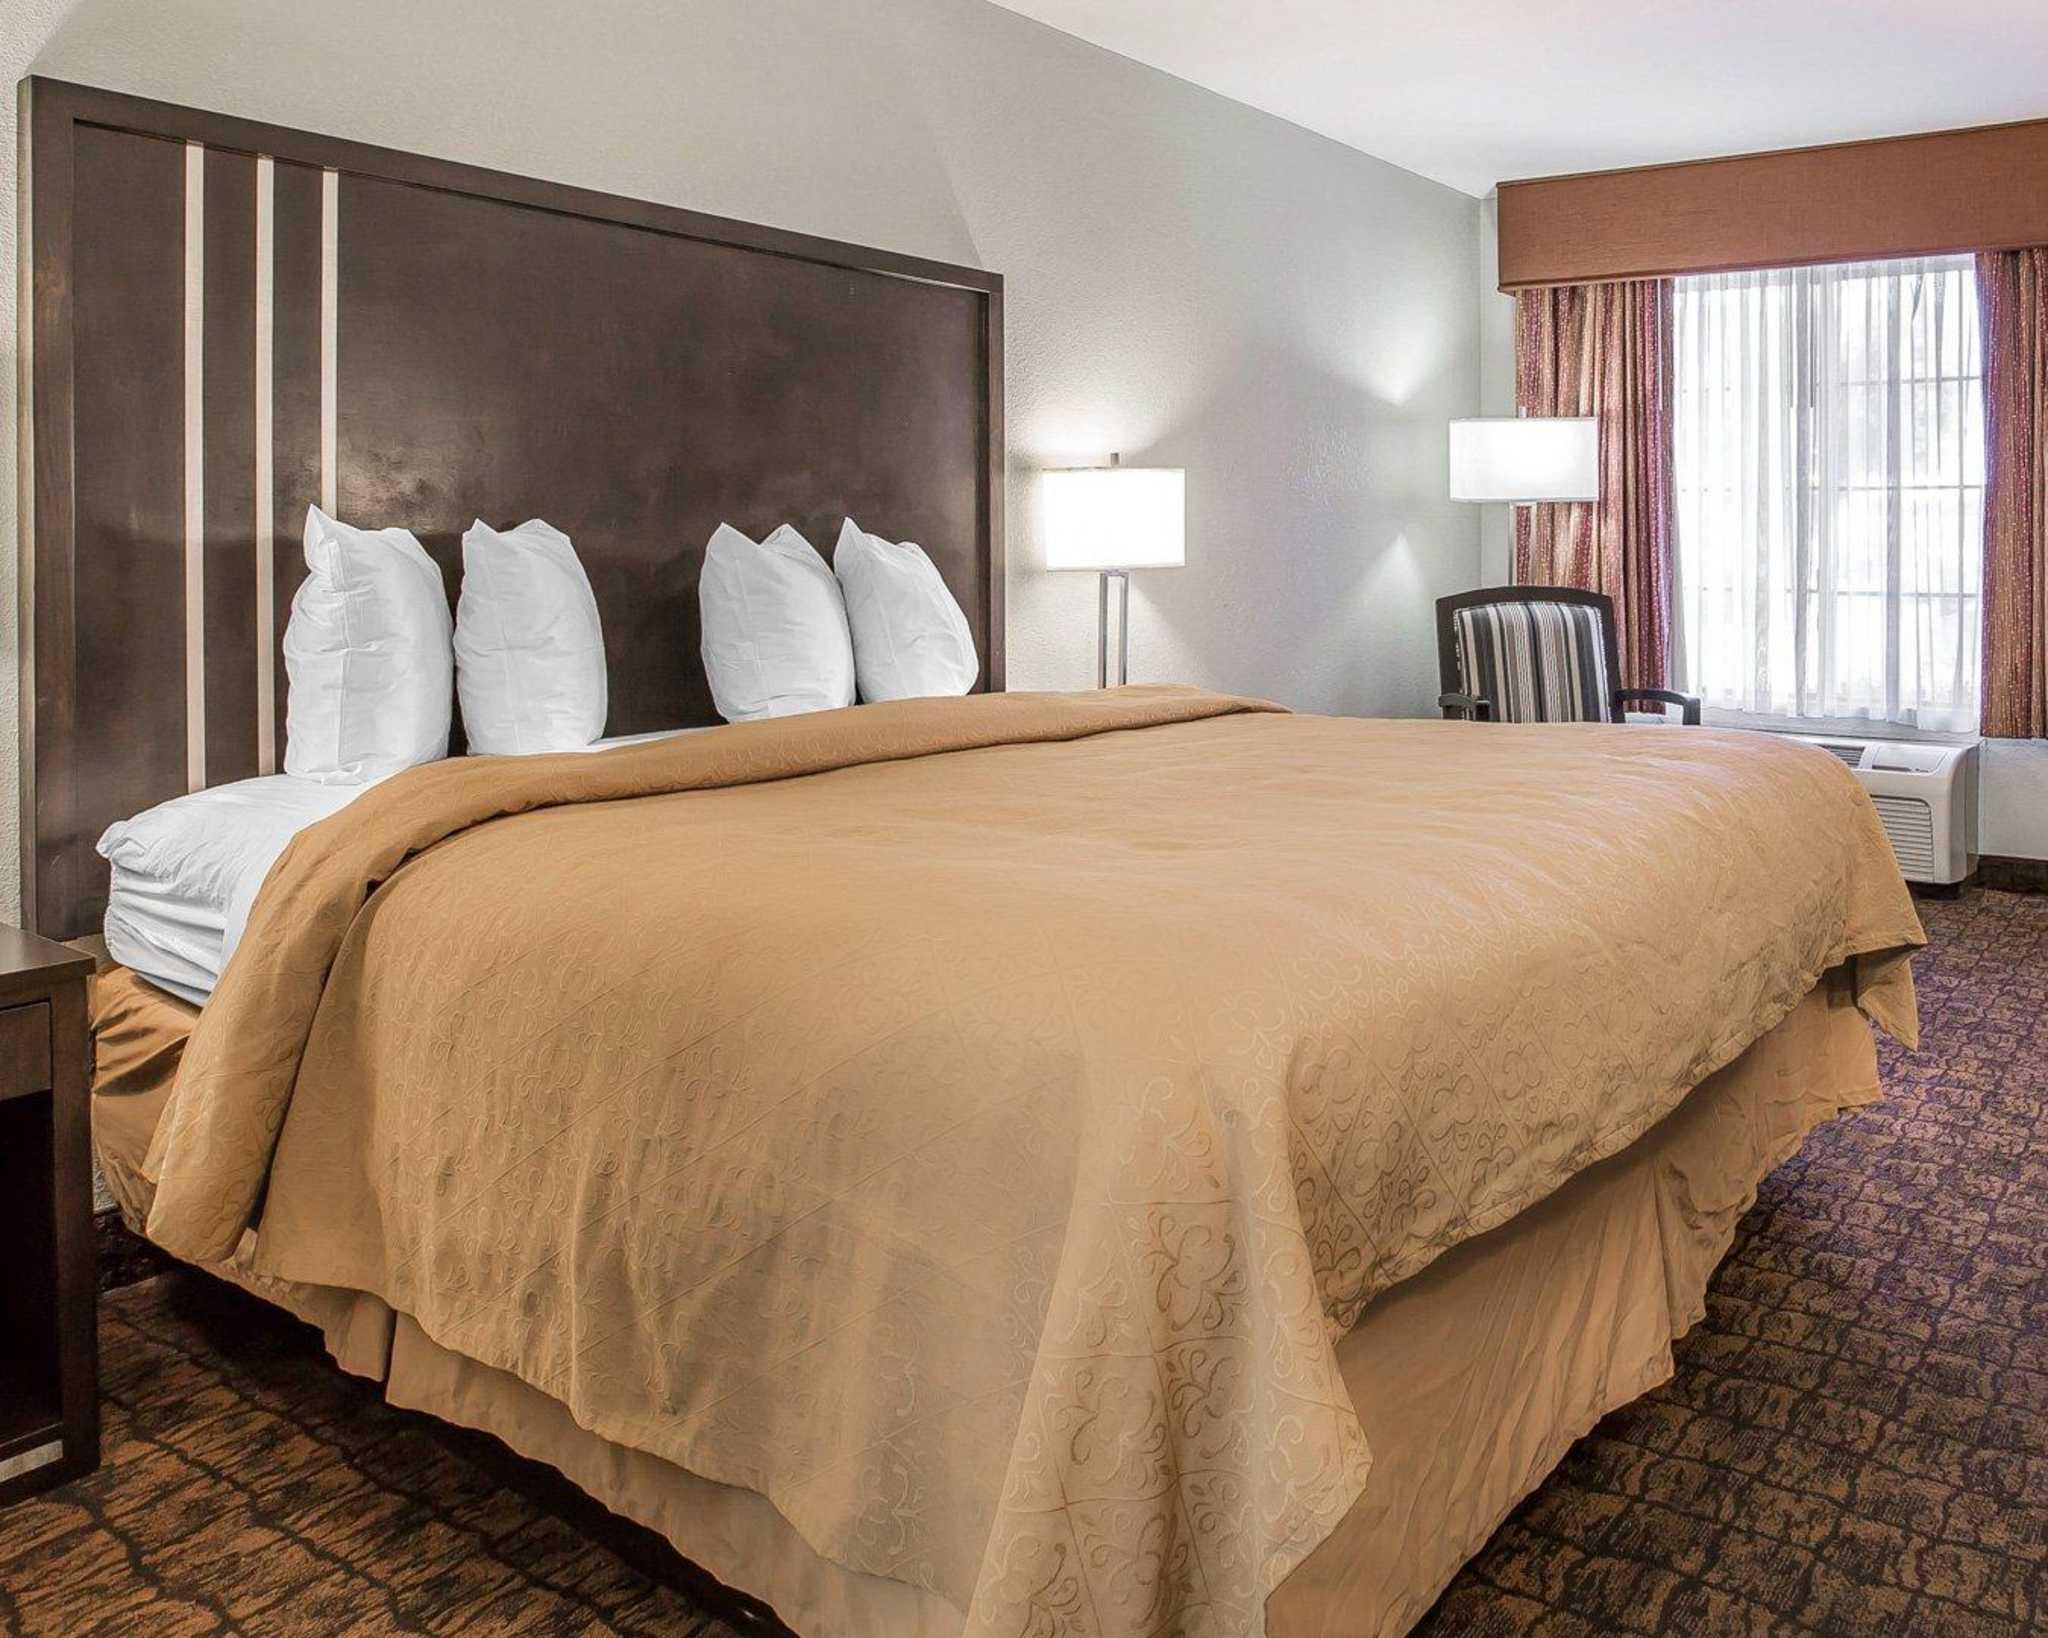 Quality Inn & Suites Woodland - Sacramento Airport image 11